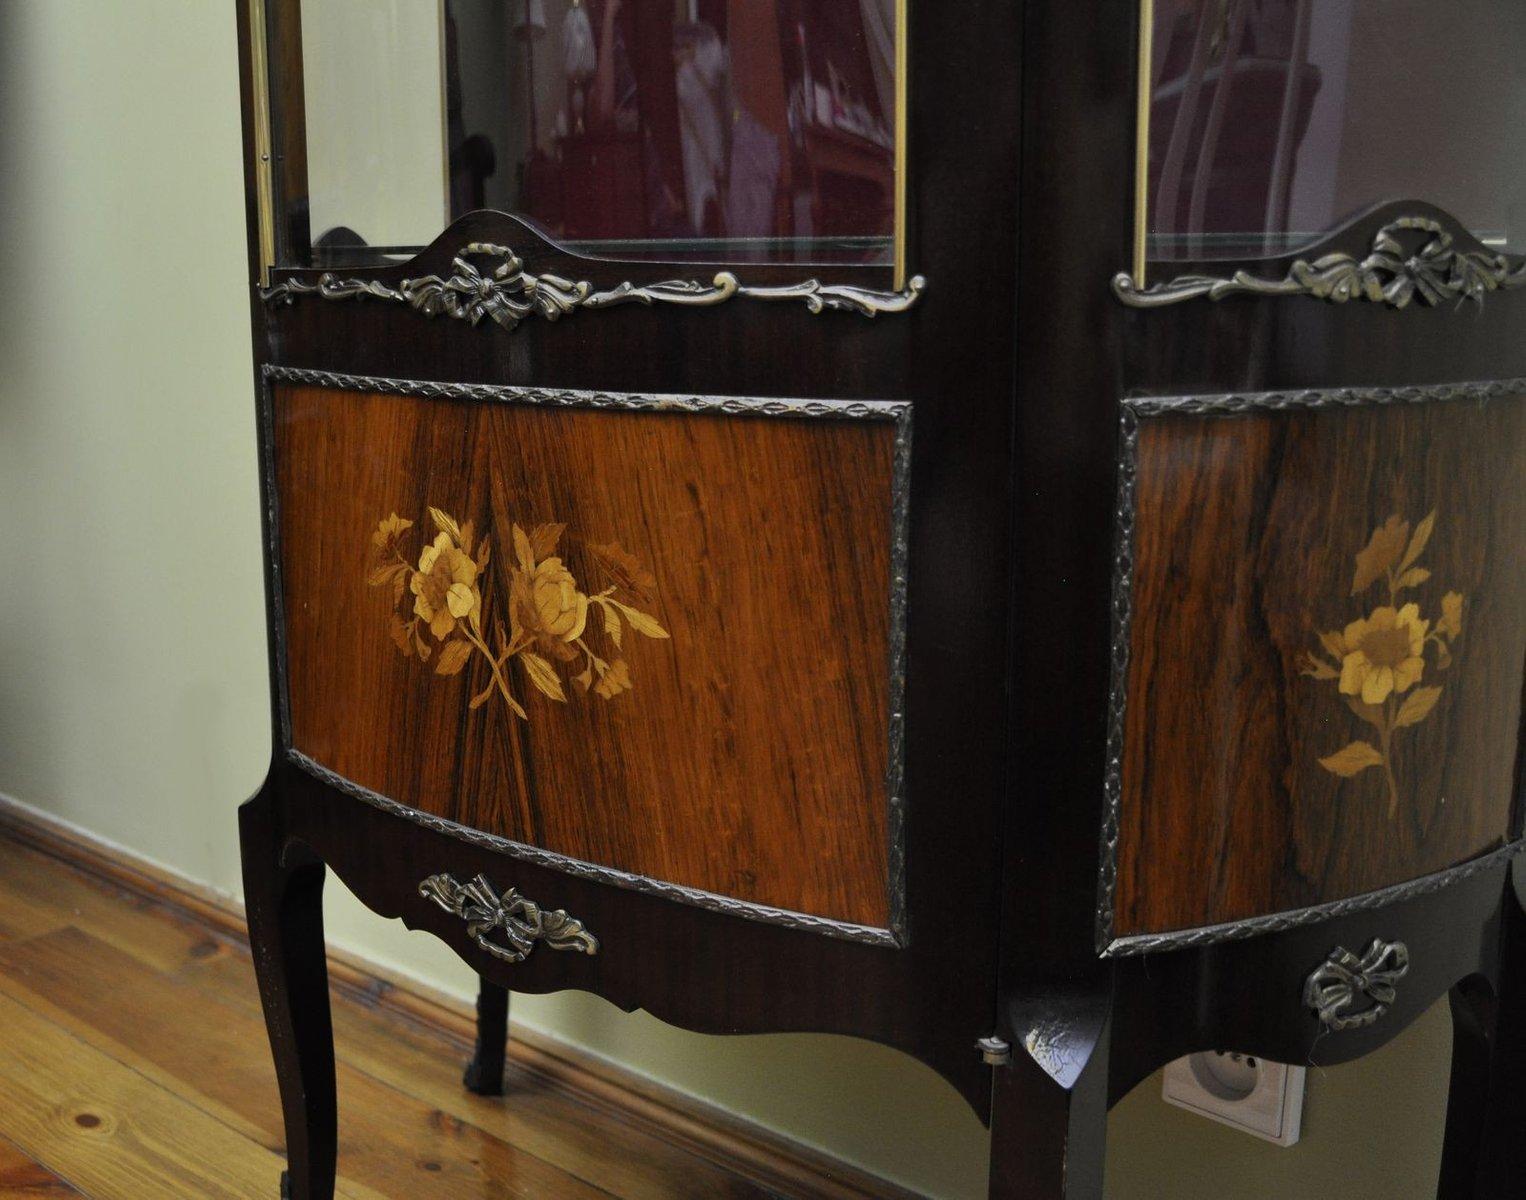 Vintage Display Cabinet 1950s 8. $2577.00. Price per piece & Vintage Display Cabinet 1950s for sale at Pamono